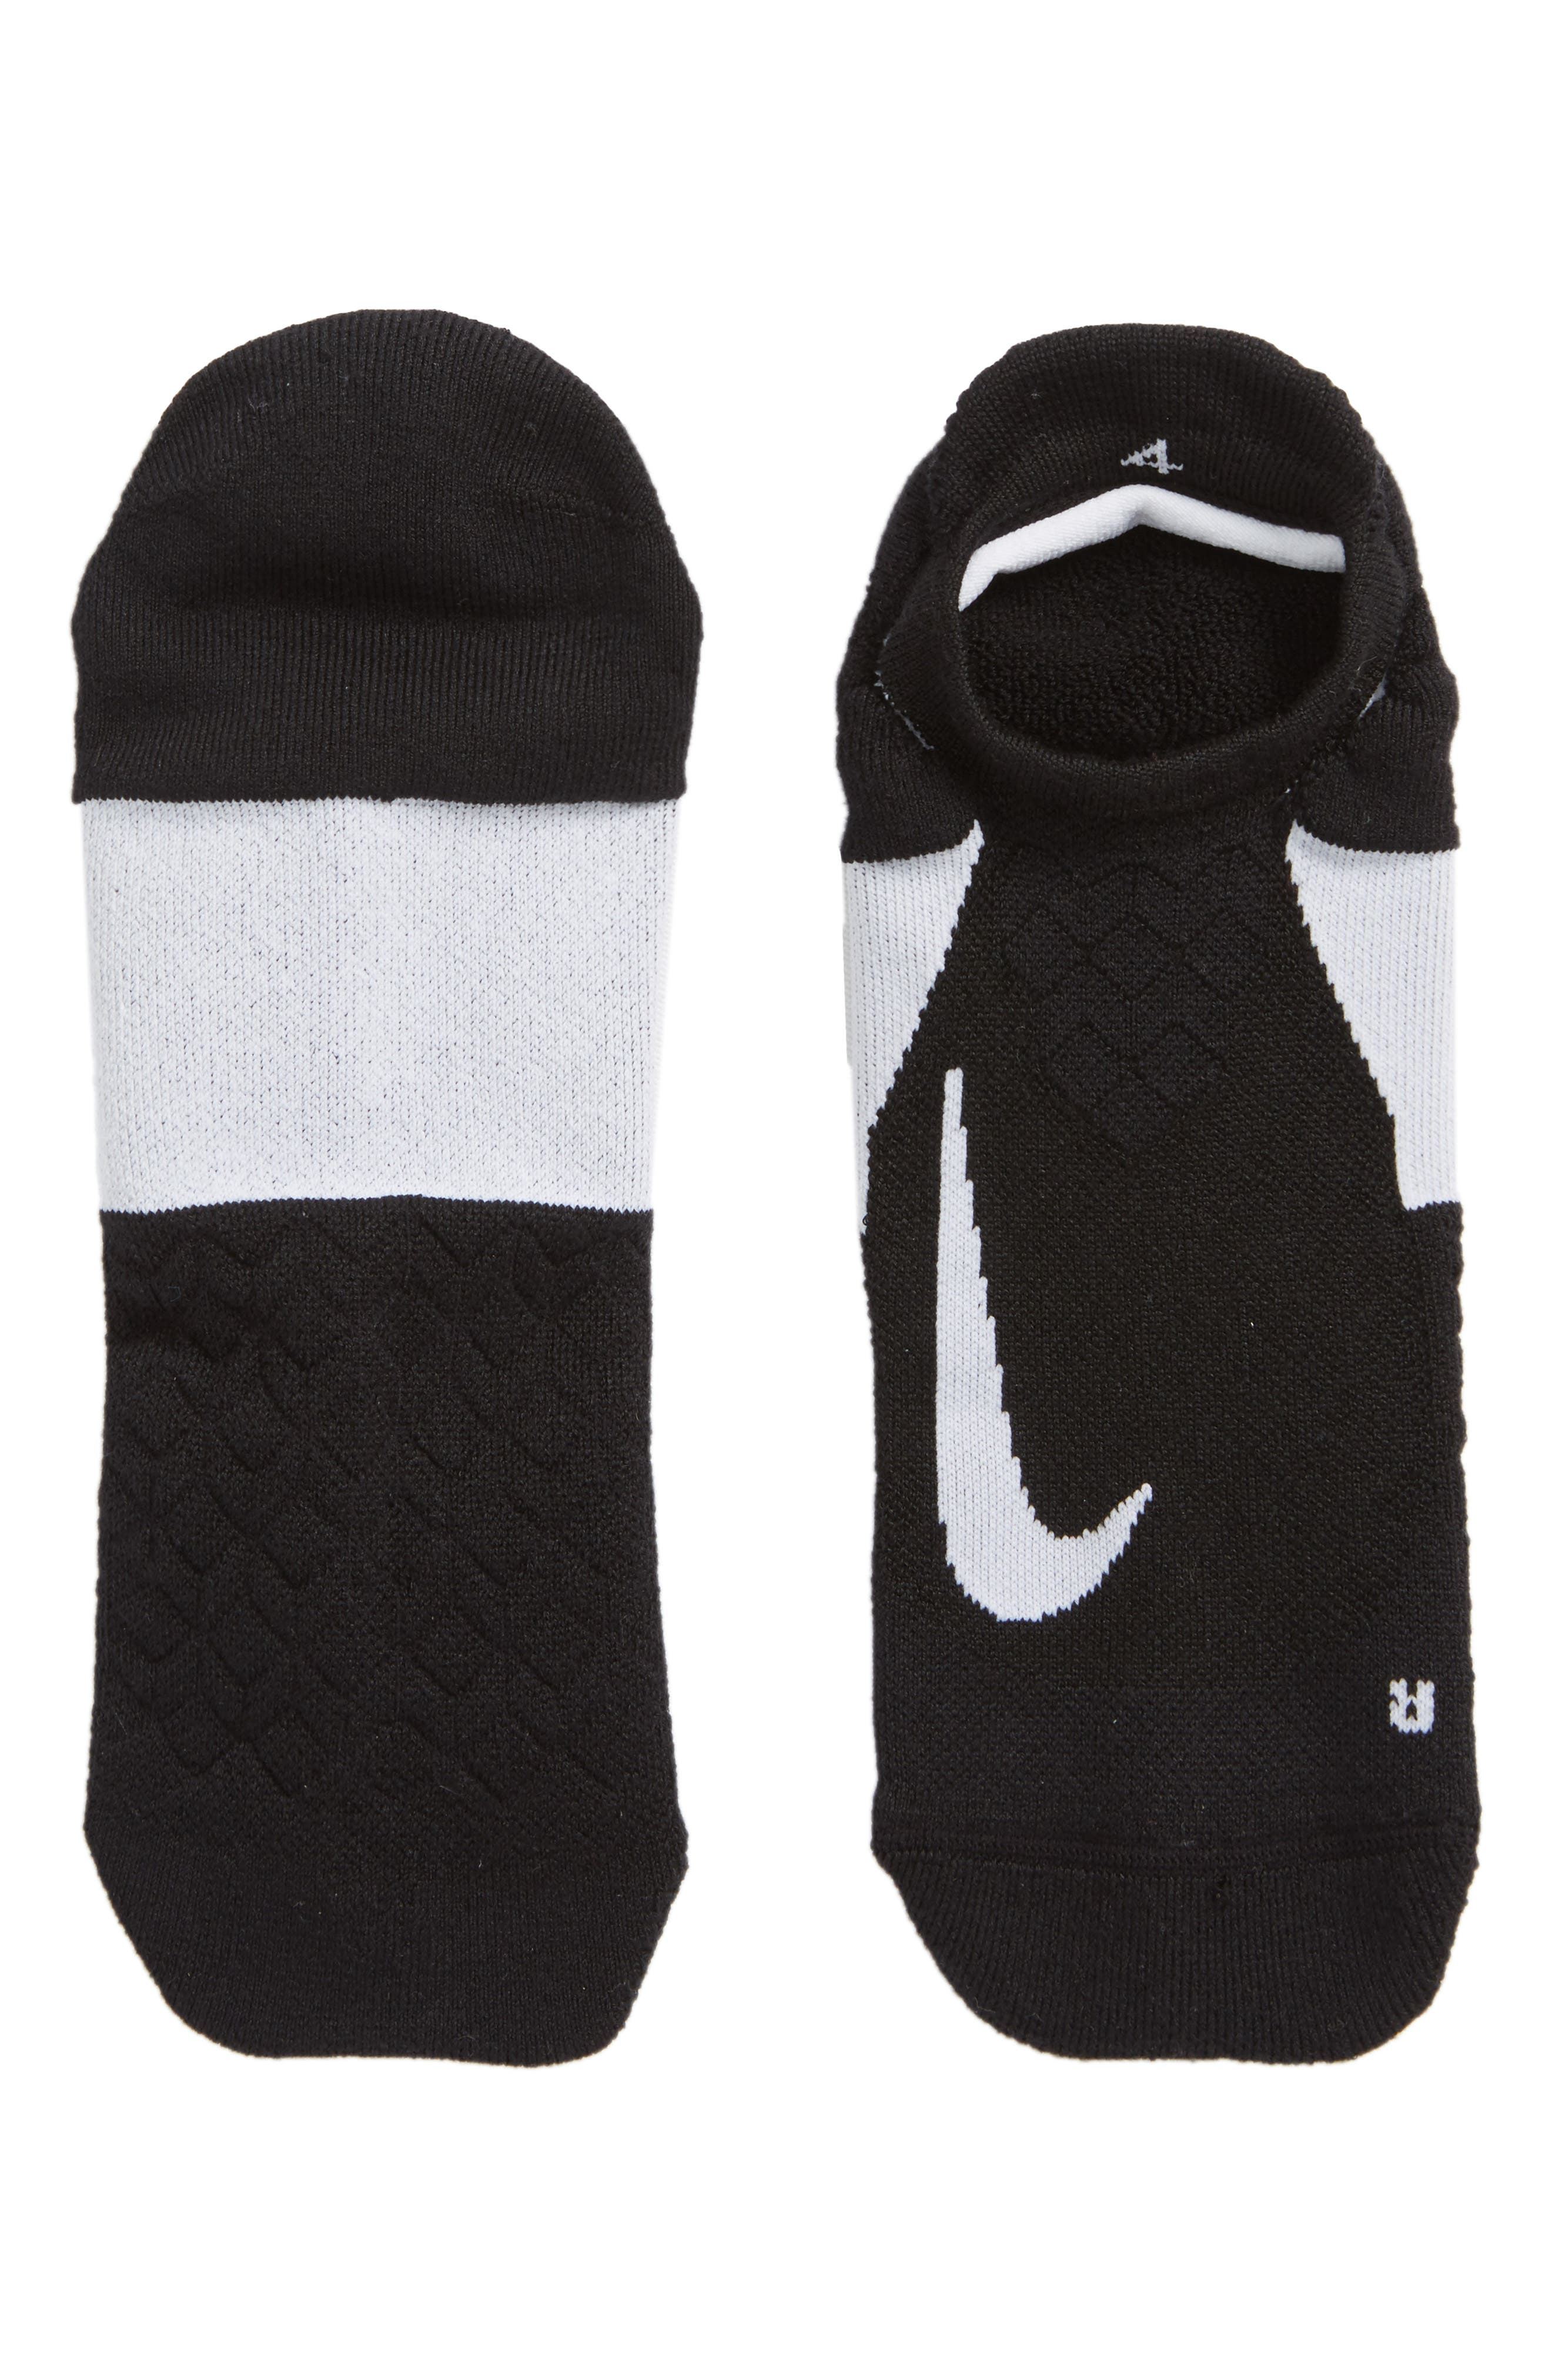 Elite Cushioned No-Show Tab Running Socks,                             Alternate thumbnail 4, color,                             Black